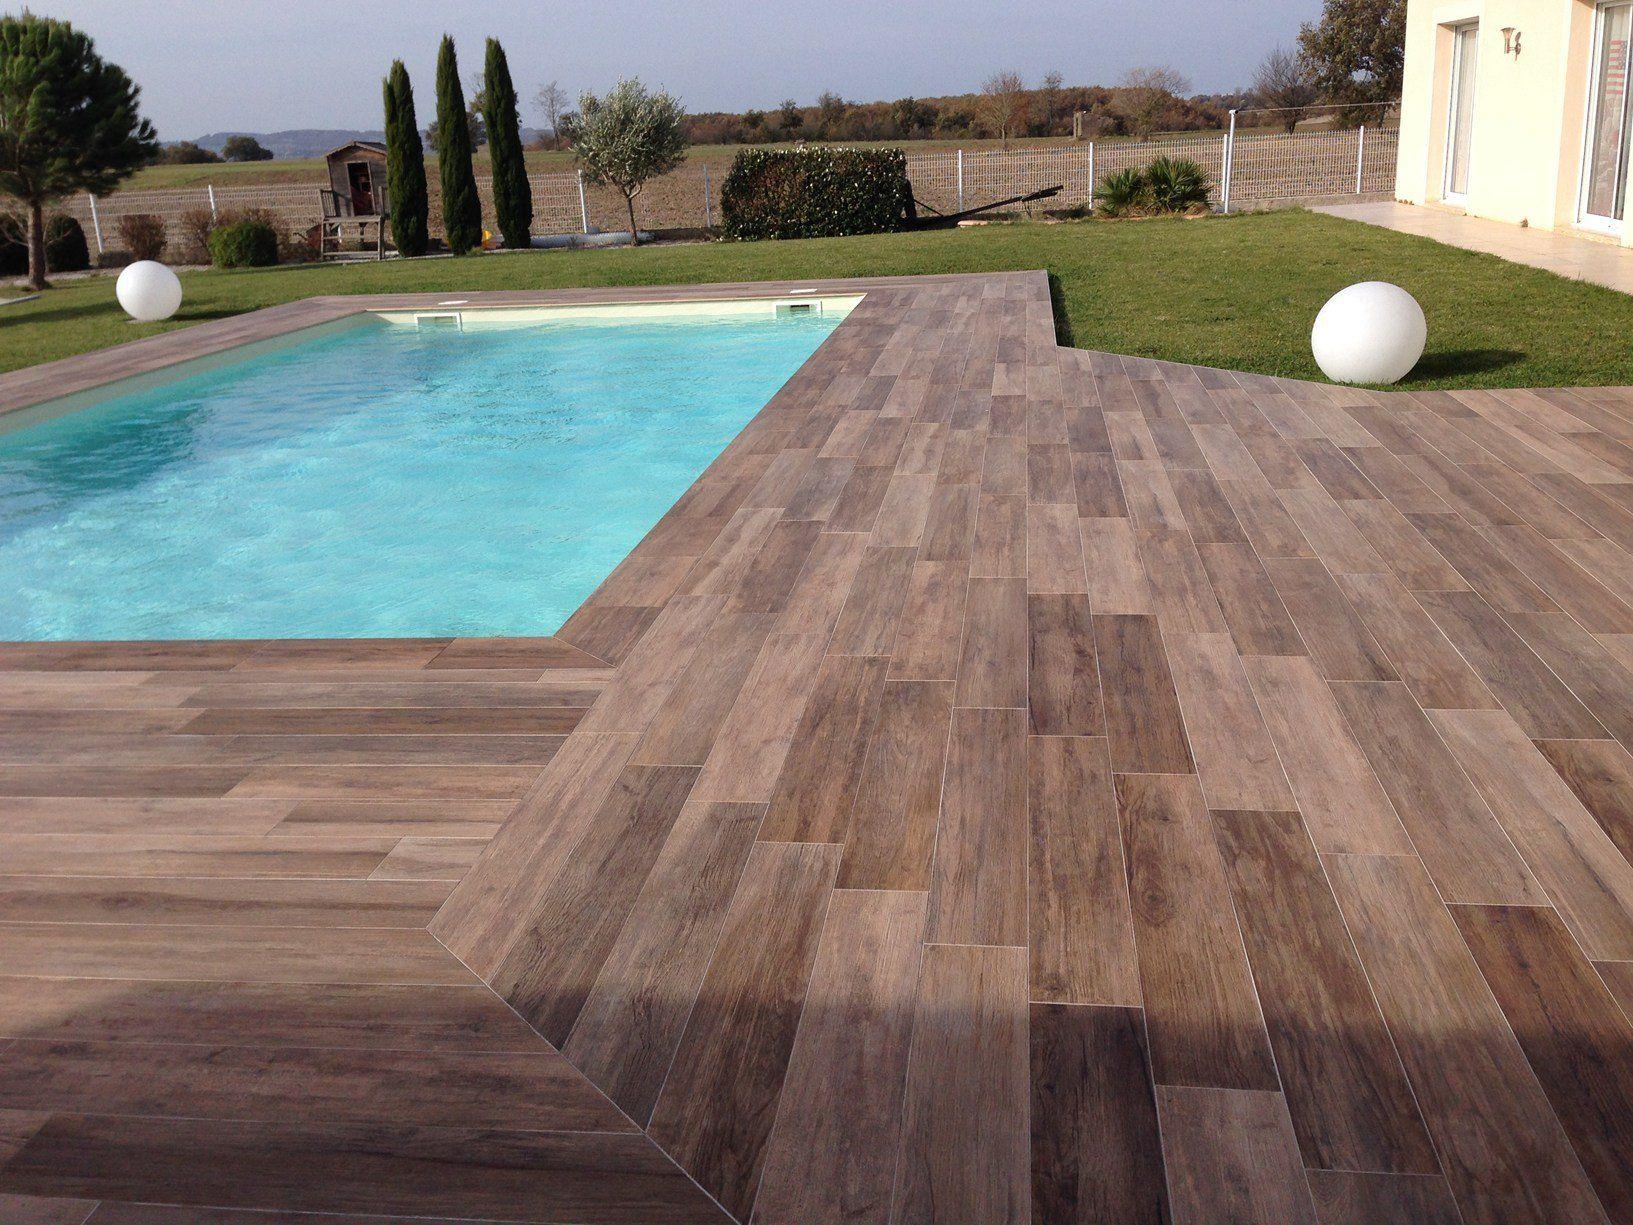 Pavimentazione per piscina piastrelle antiscivolo per piscina